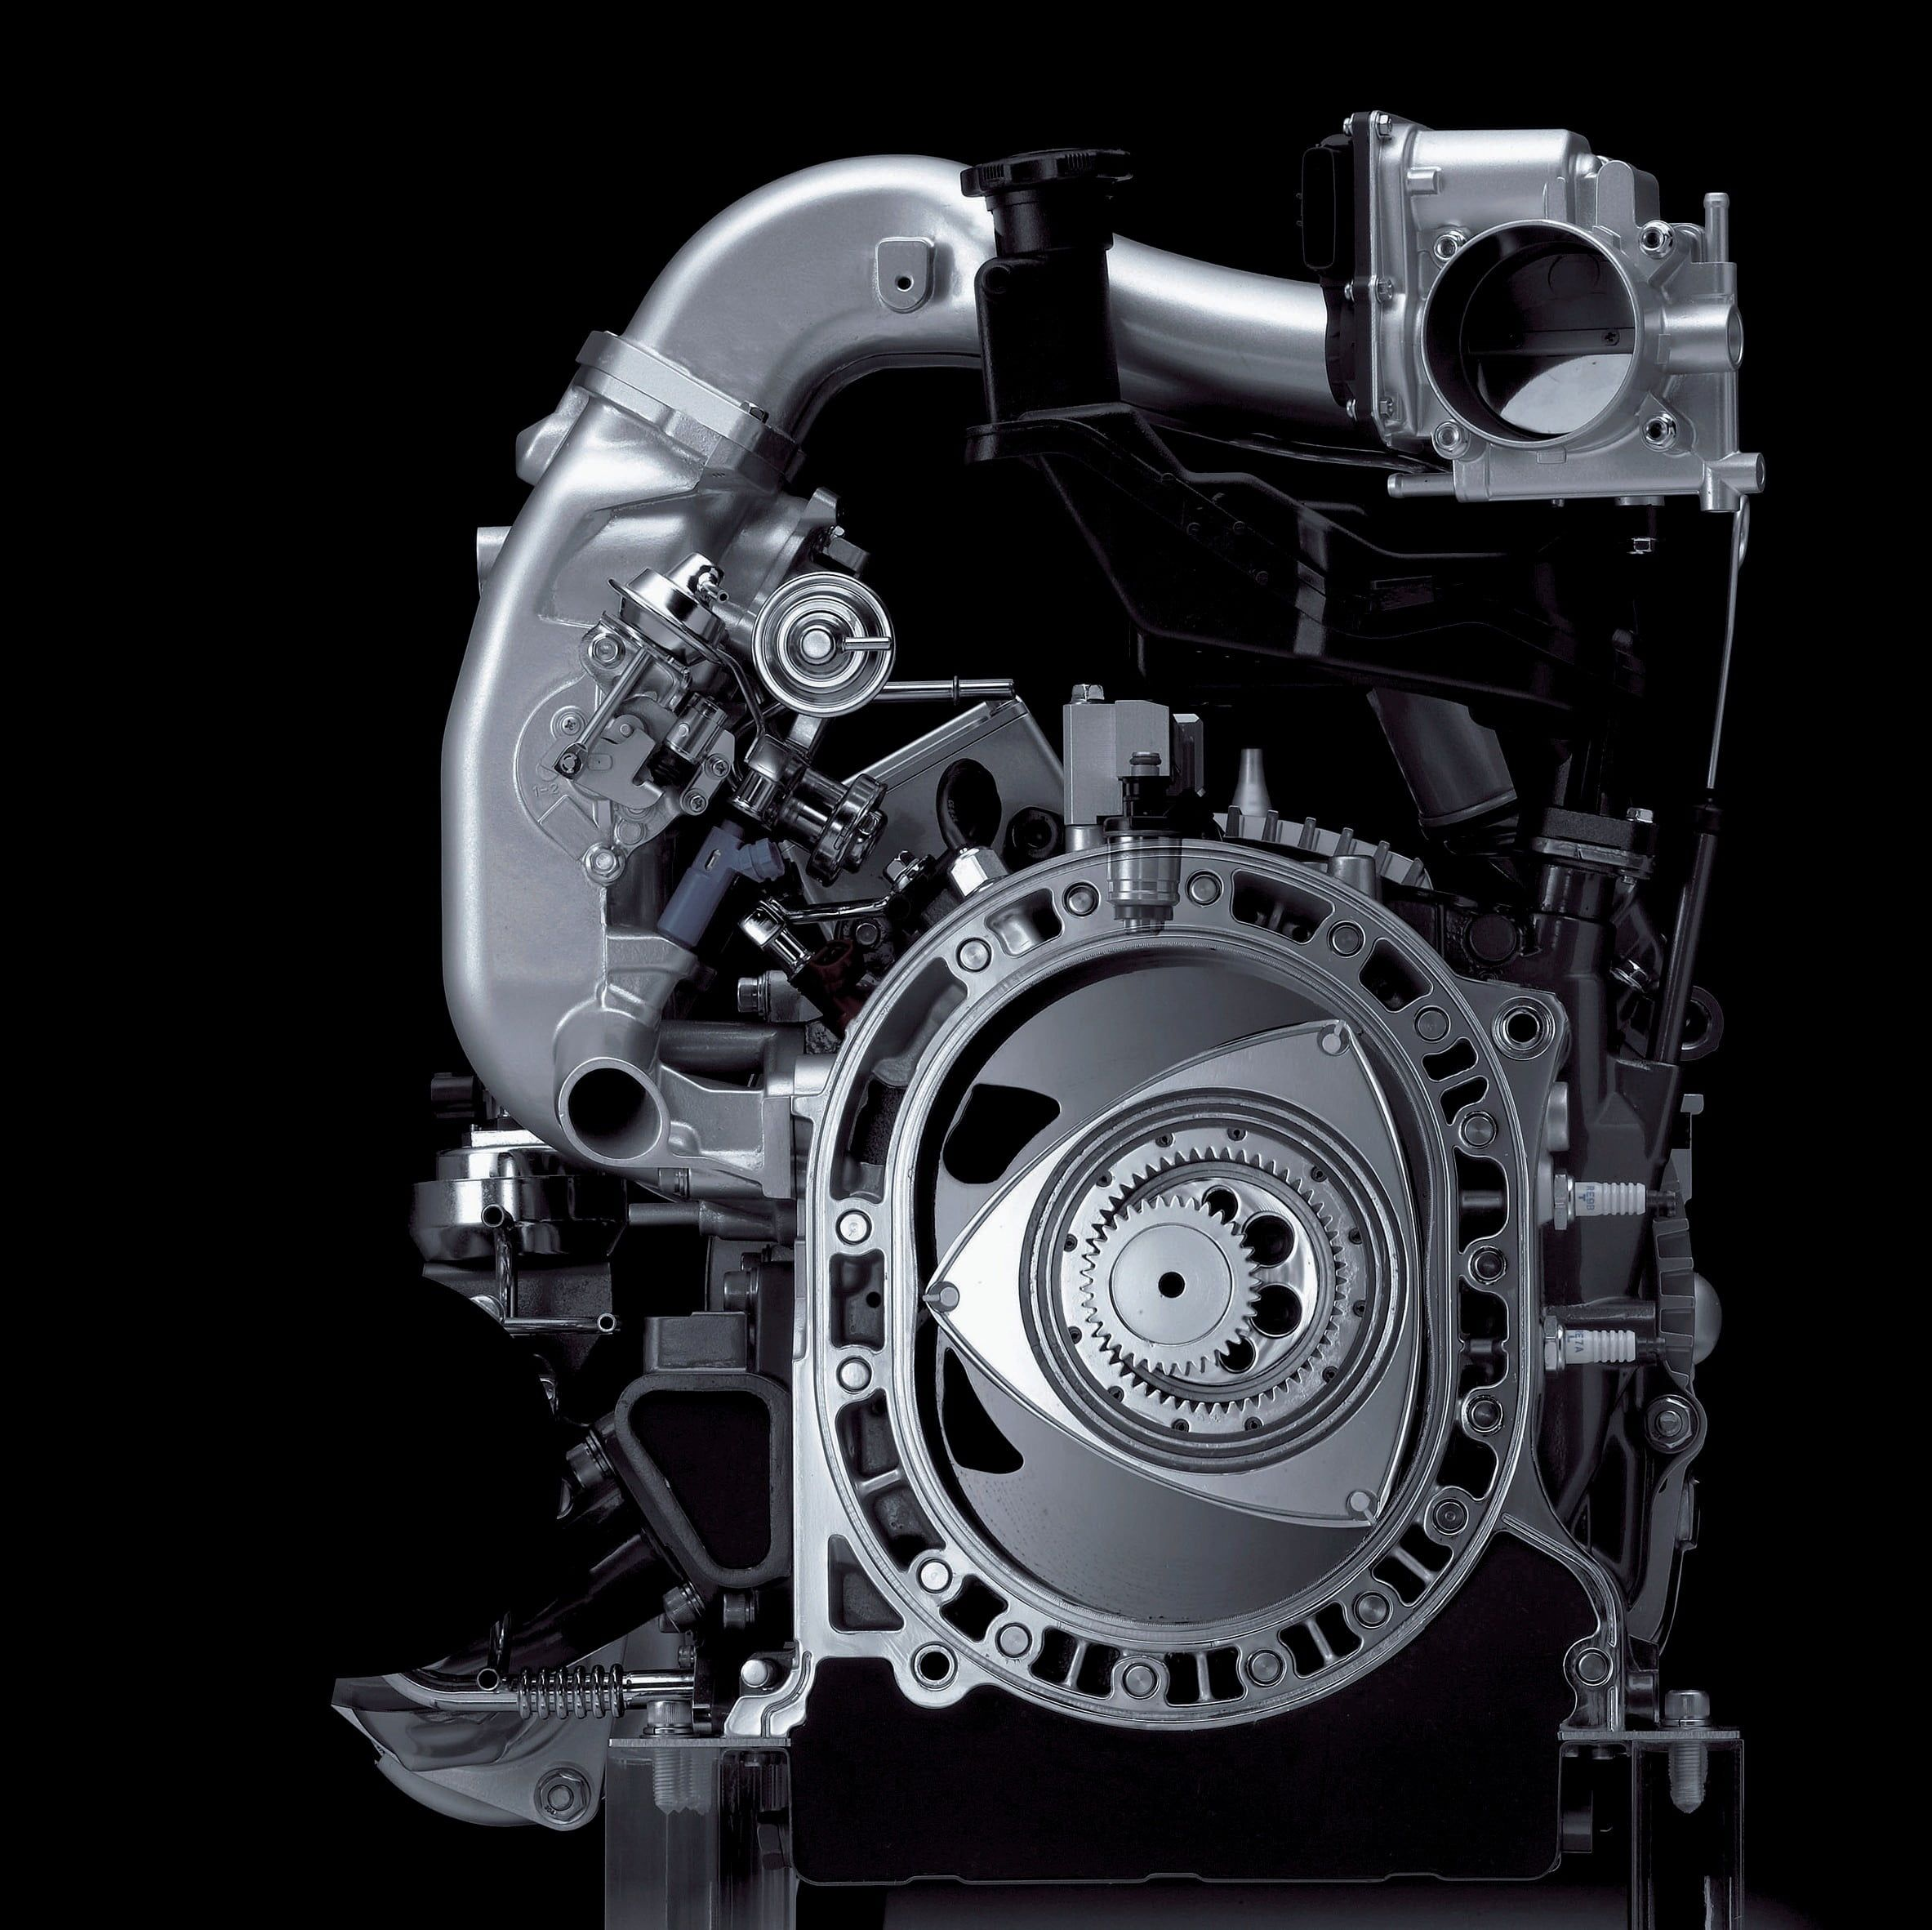 Motors Wankel Engine Engines 1080p Wallpaper Hdwallpaper Desktop Wankel Engine Mazda Car Lover